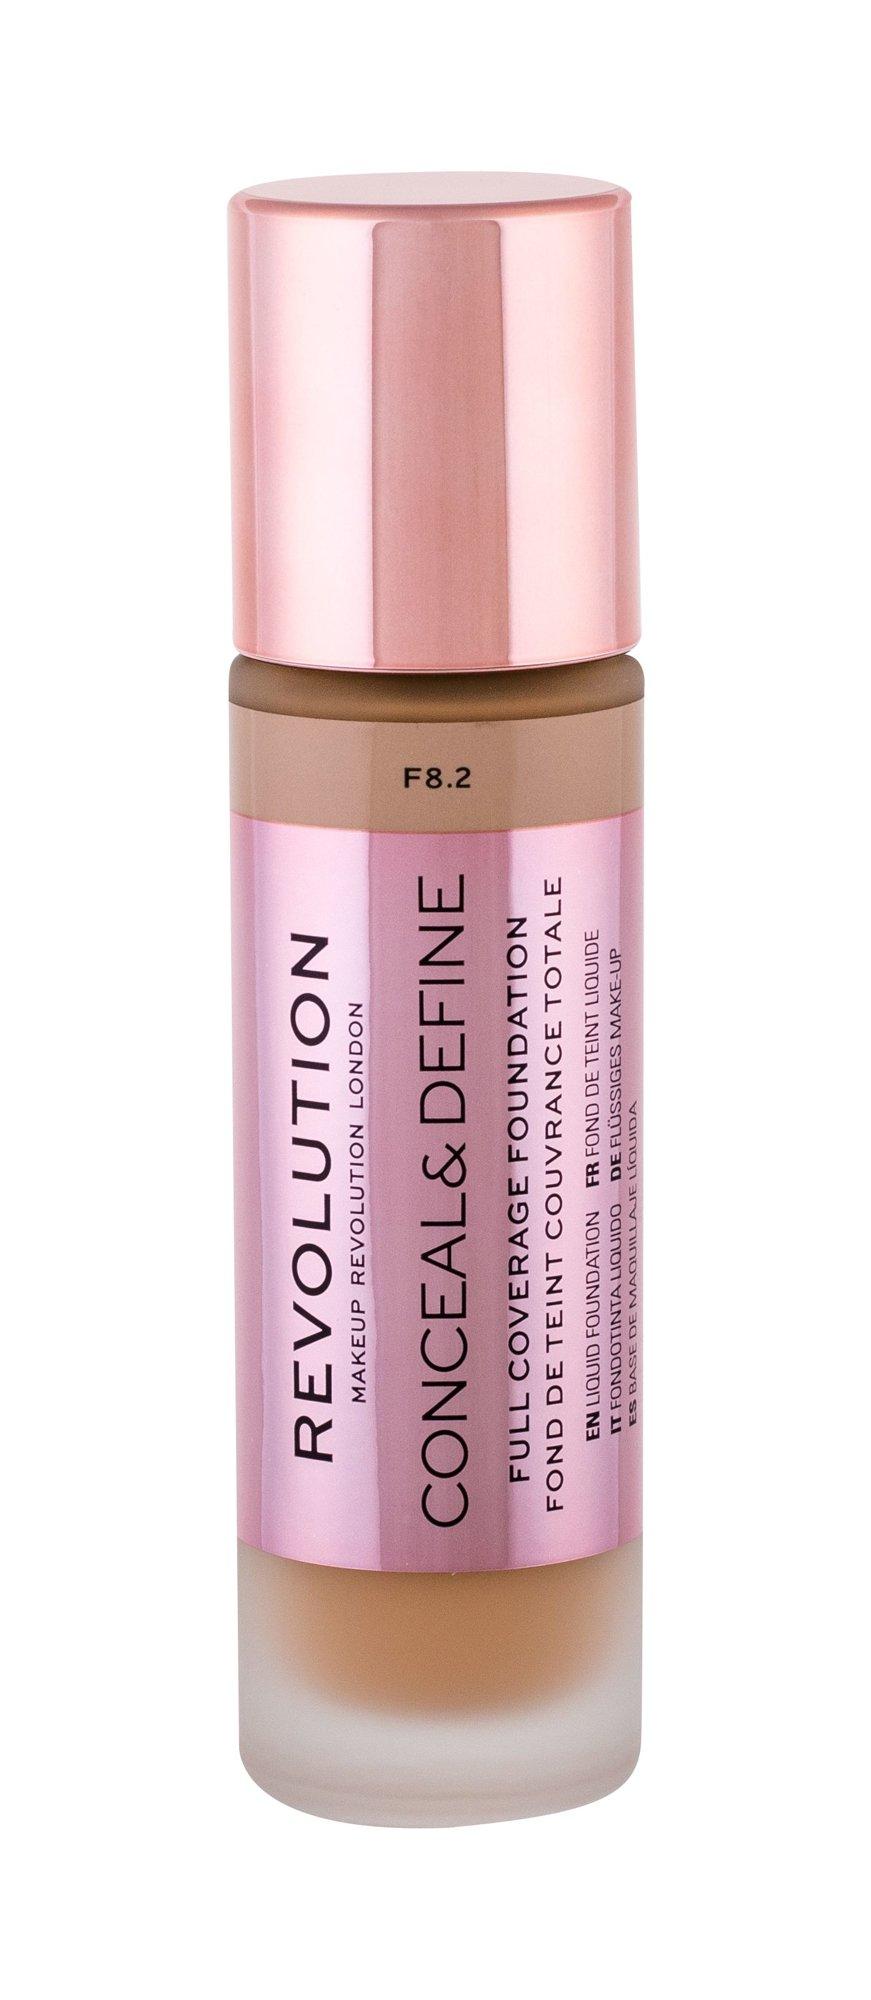 Makeup Revolution London Conceal & Define Makeup 23ml F8,2